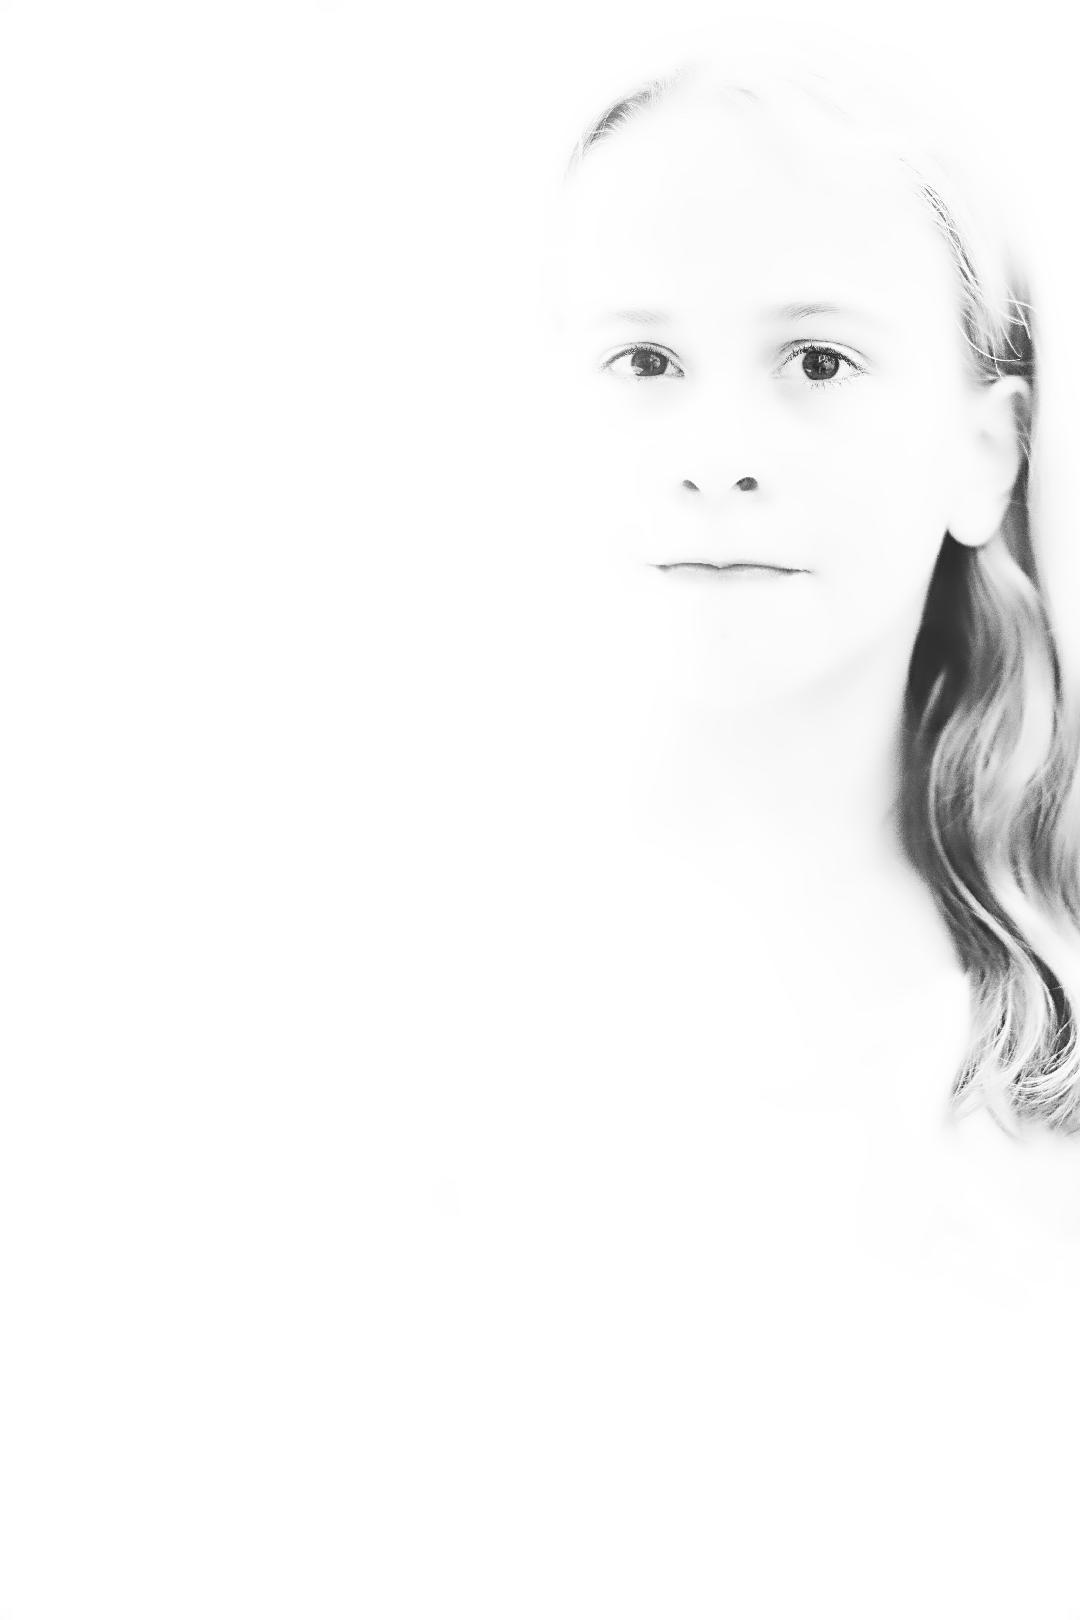 viewfinder-negatieve-ruimte-fotografie-lio-meisje-dochter.jpg